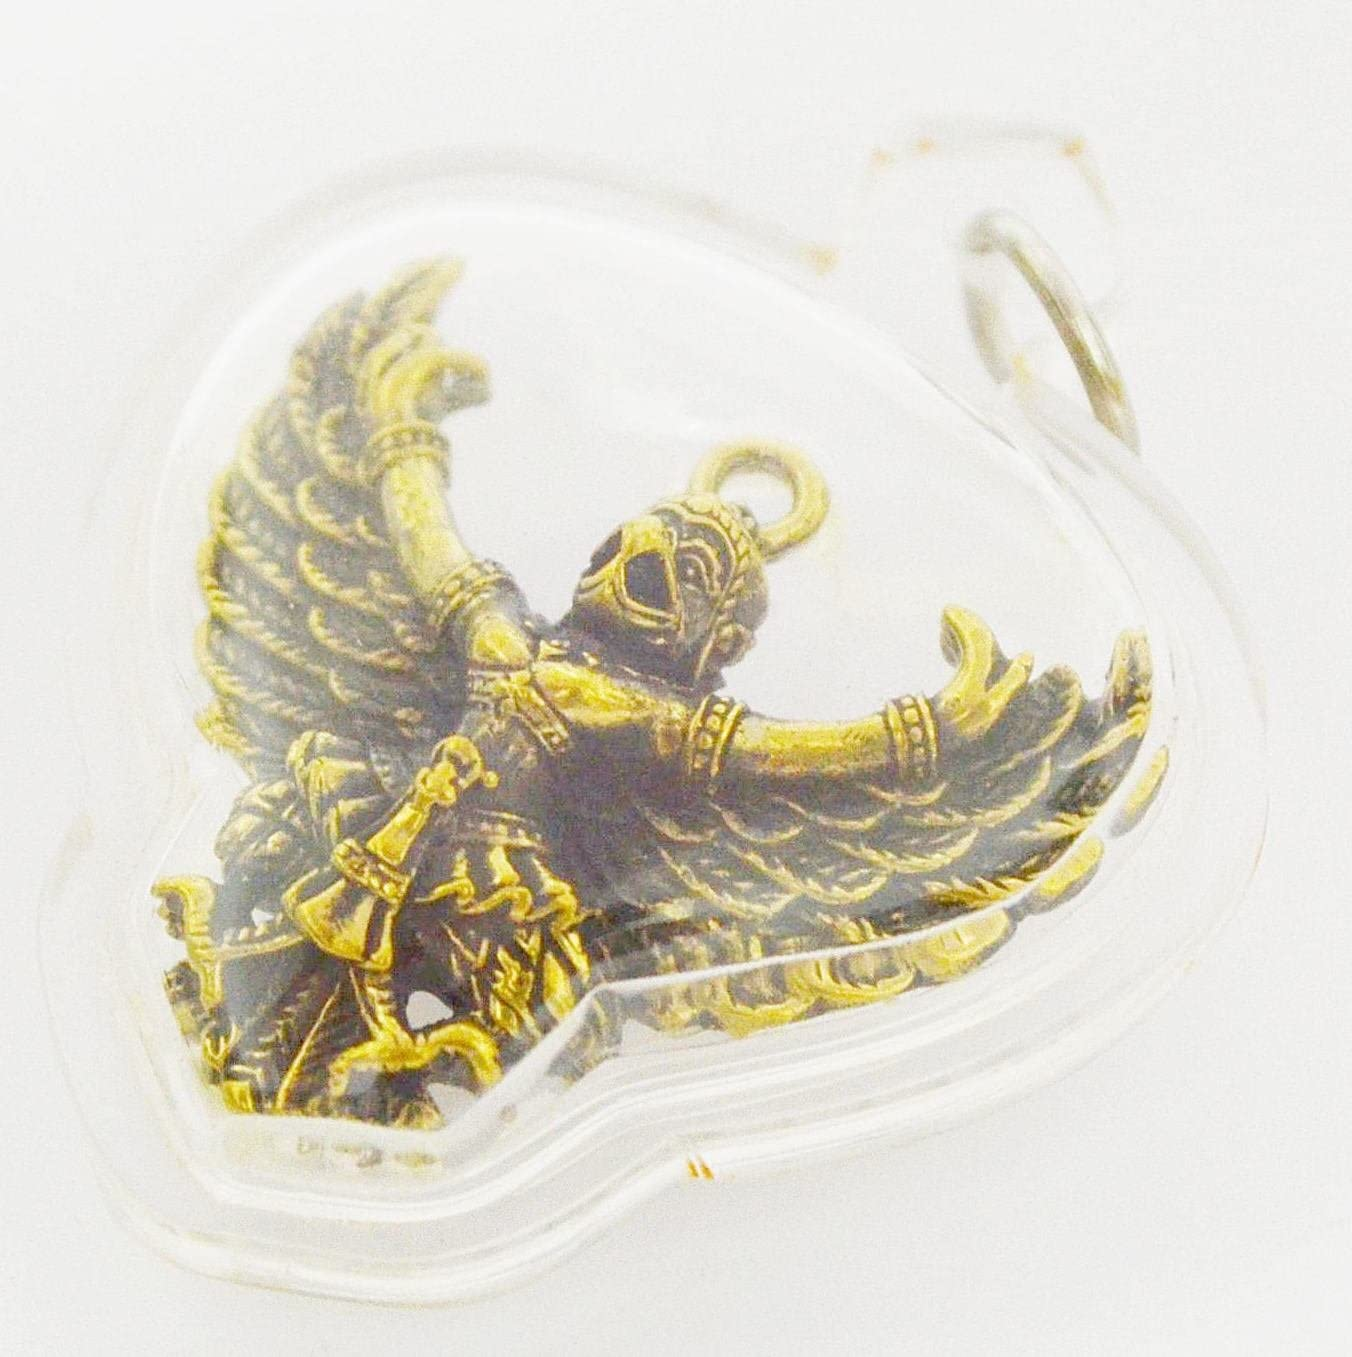 Figurine Statuette Wasp Hornet Magic Black Thai Thailand Buddhism Brass